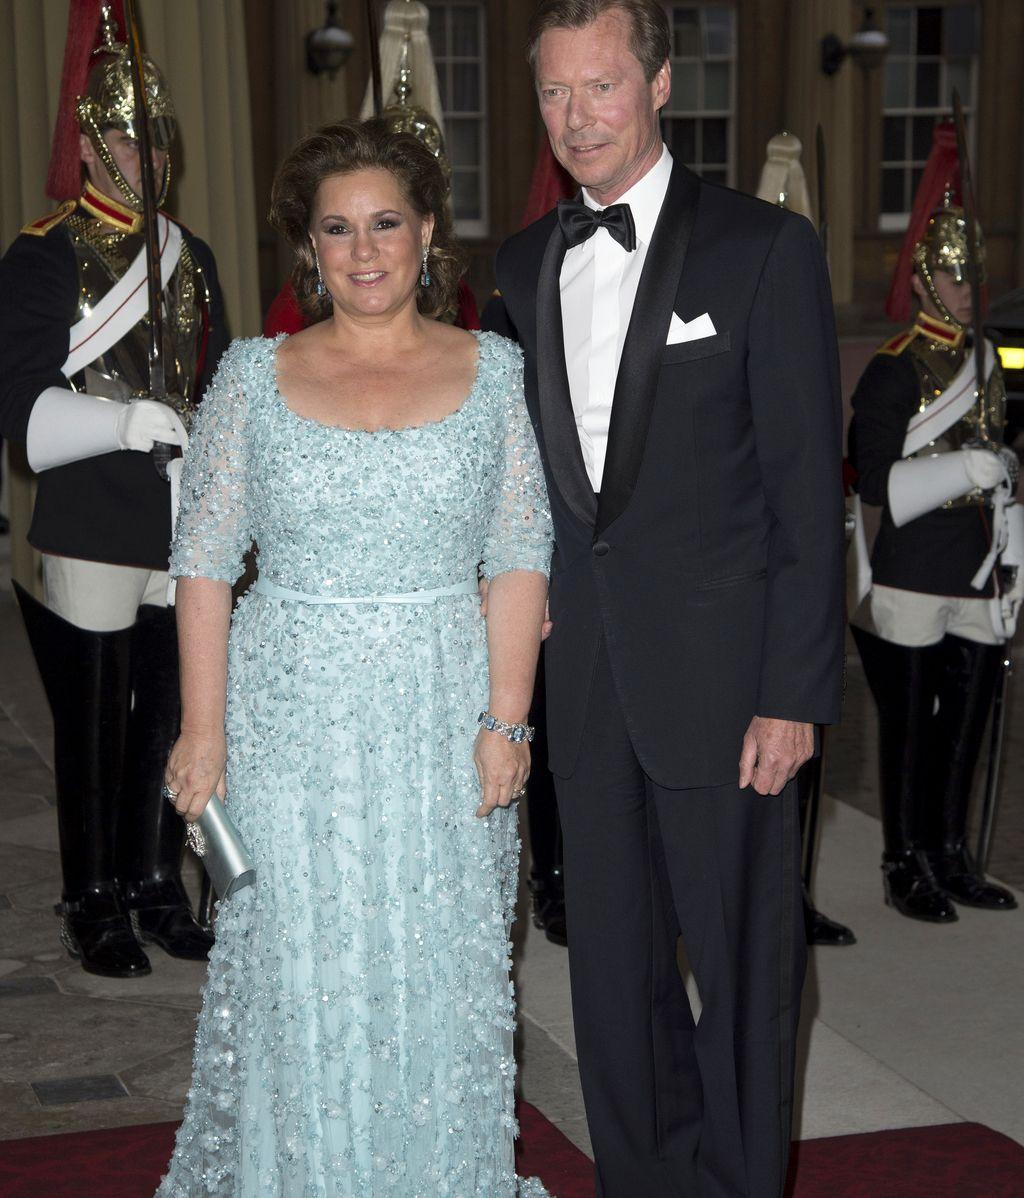 Gran Duquesa María Teresa de Luxemburgo